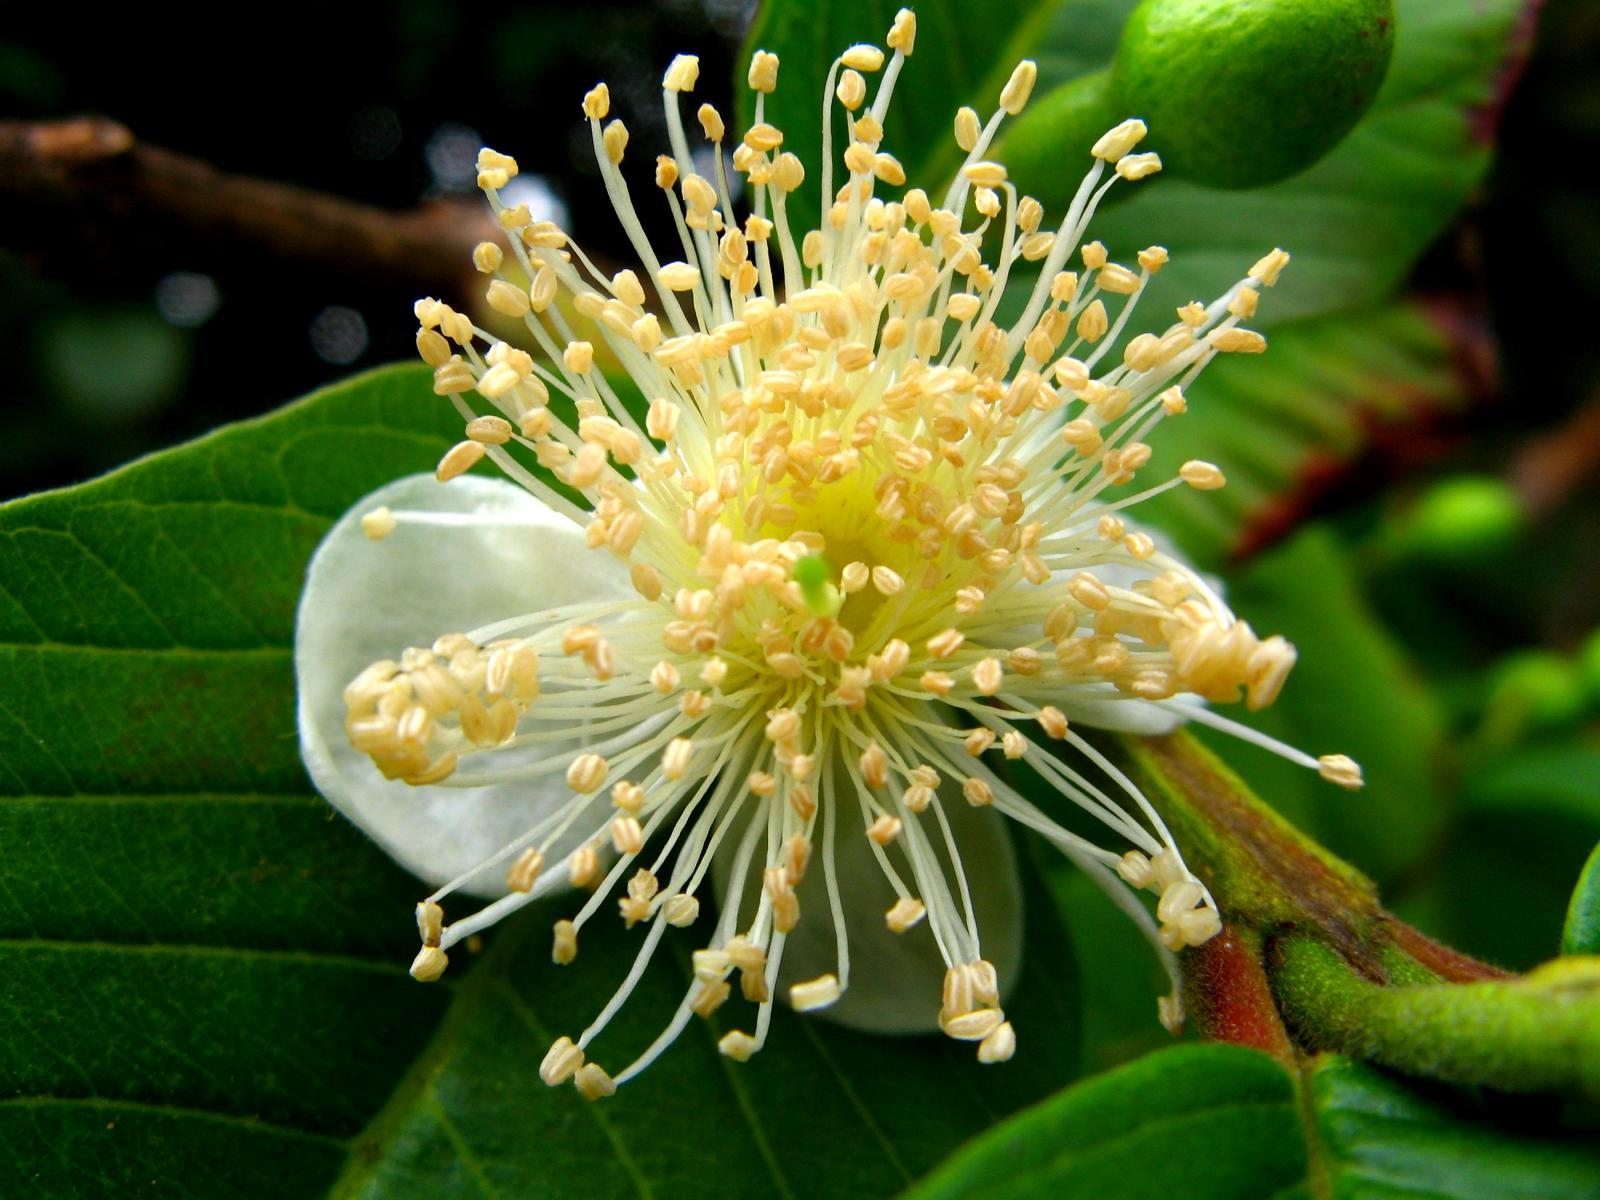 psidium guajava Common name: apple guava, common guava, lemon guava family: myrtaceae synonymous: psidium guajava var cujavillum psidium guajava var guajava psidium guajava var minor.